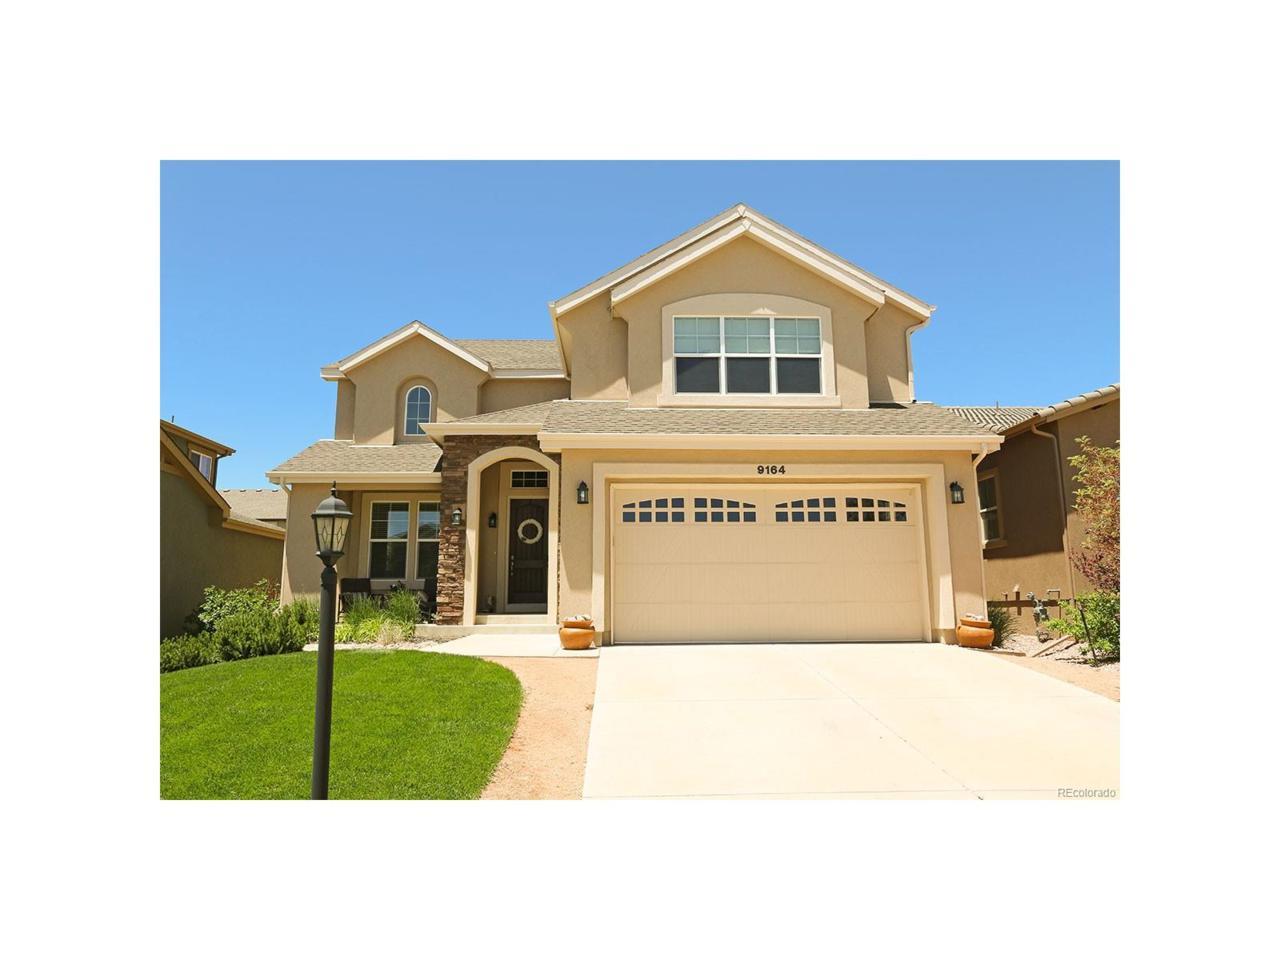 9164 Lizard Rock Trail, Colorado Springs, CO 80924 (MLS #2574896) :: 8z Real Estate